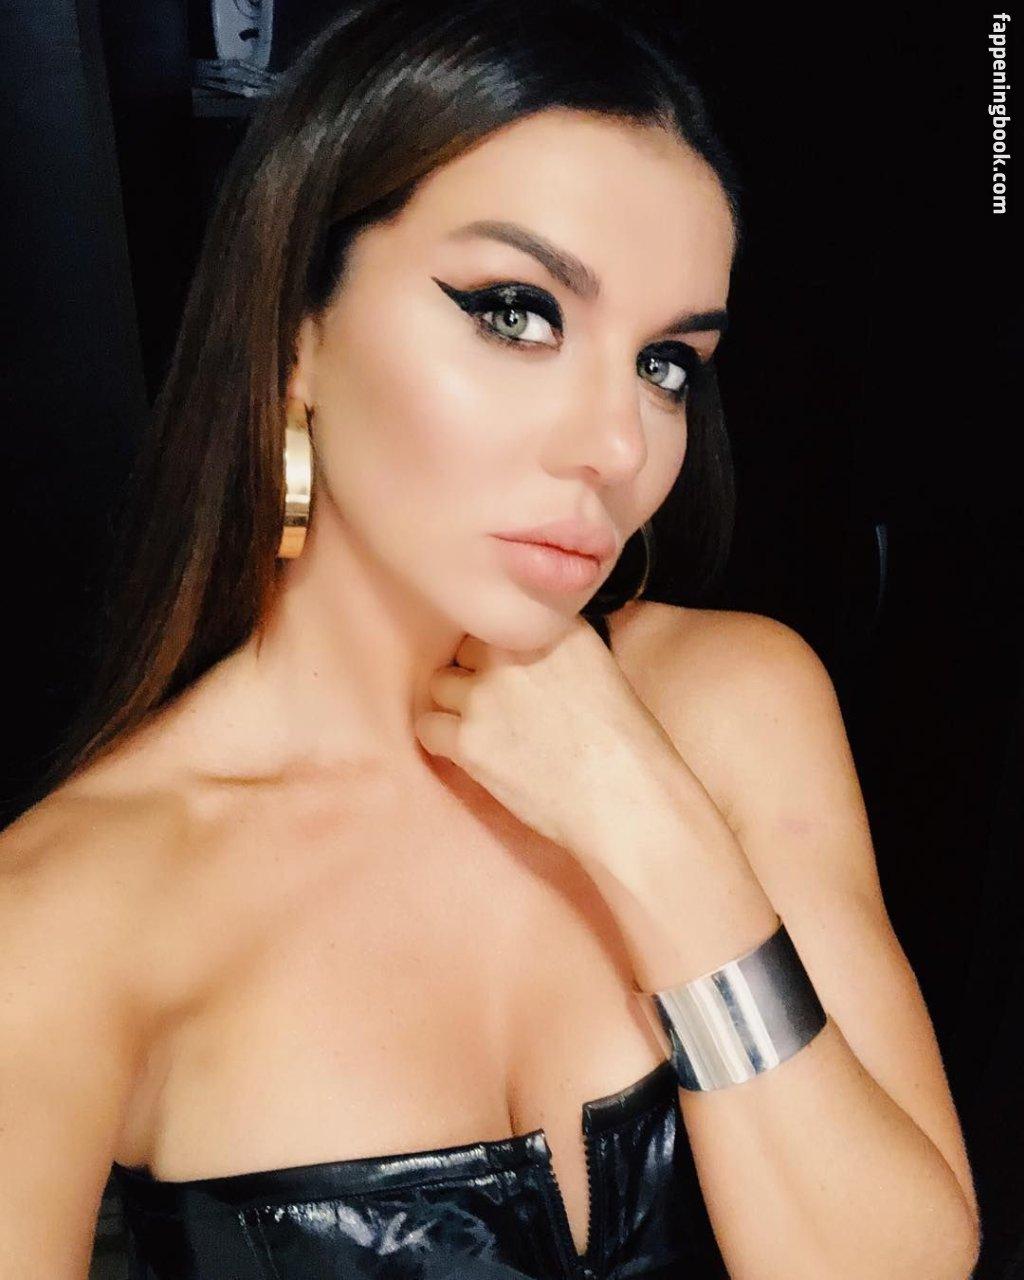 Kelly nackt Almeida Afonso De Blogger: Naudotojo